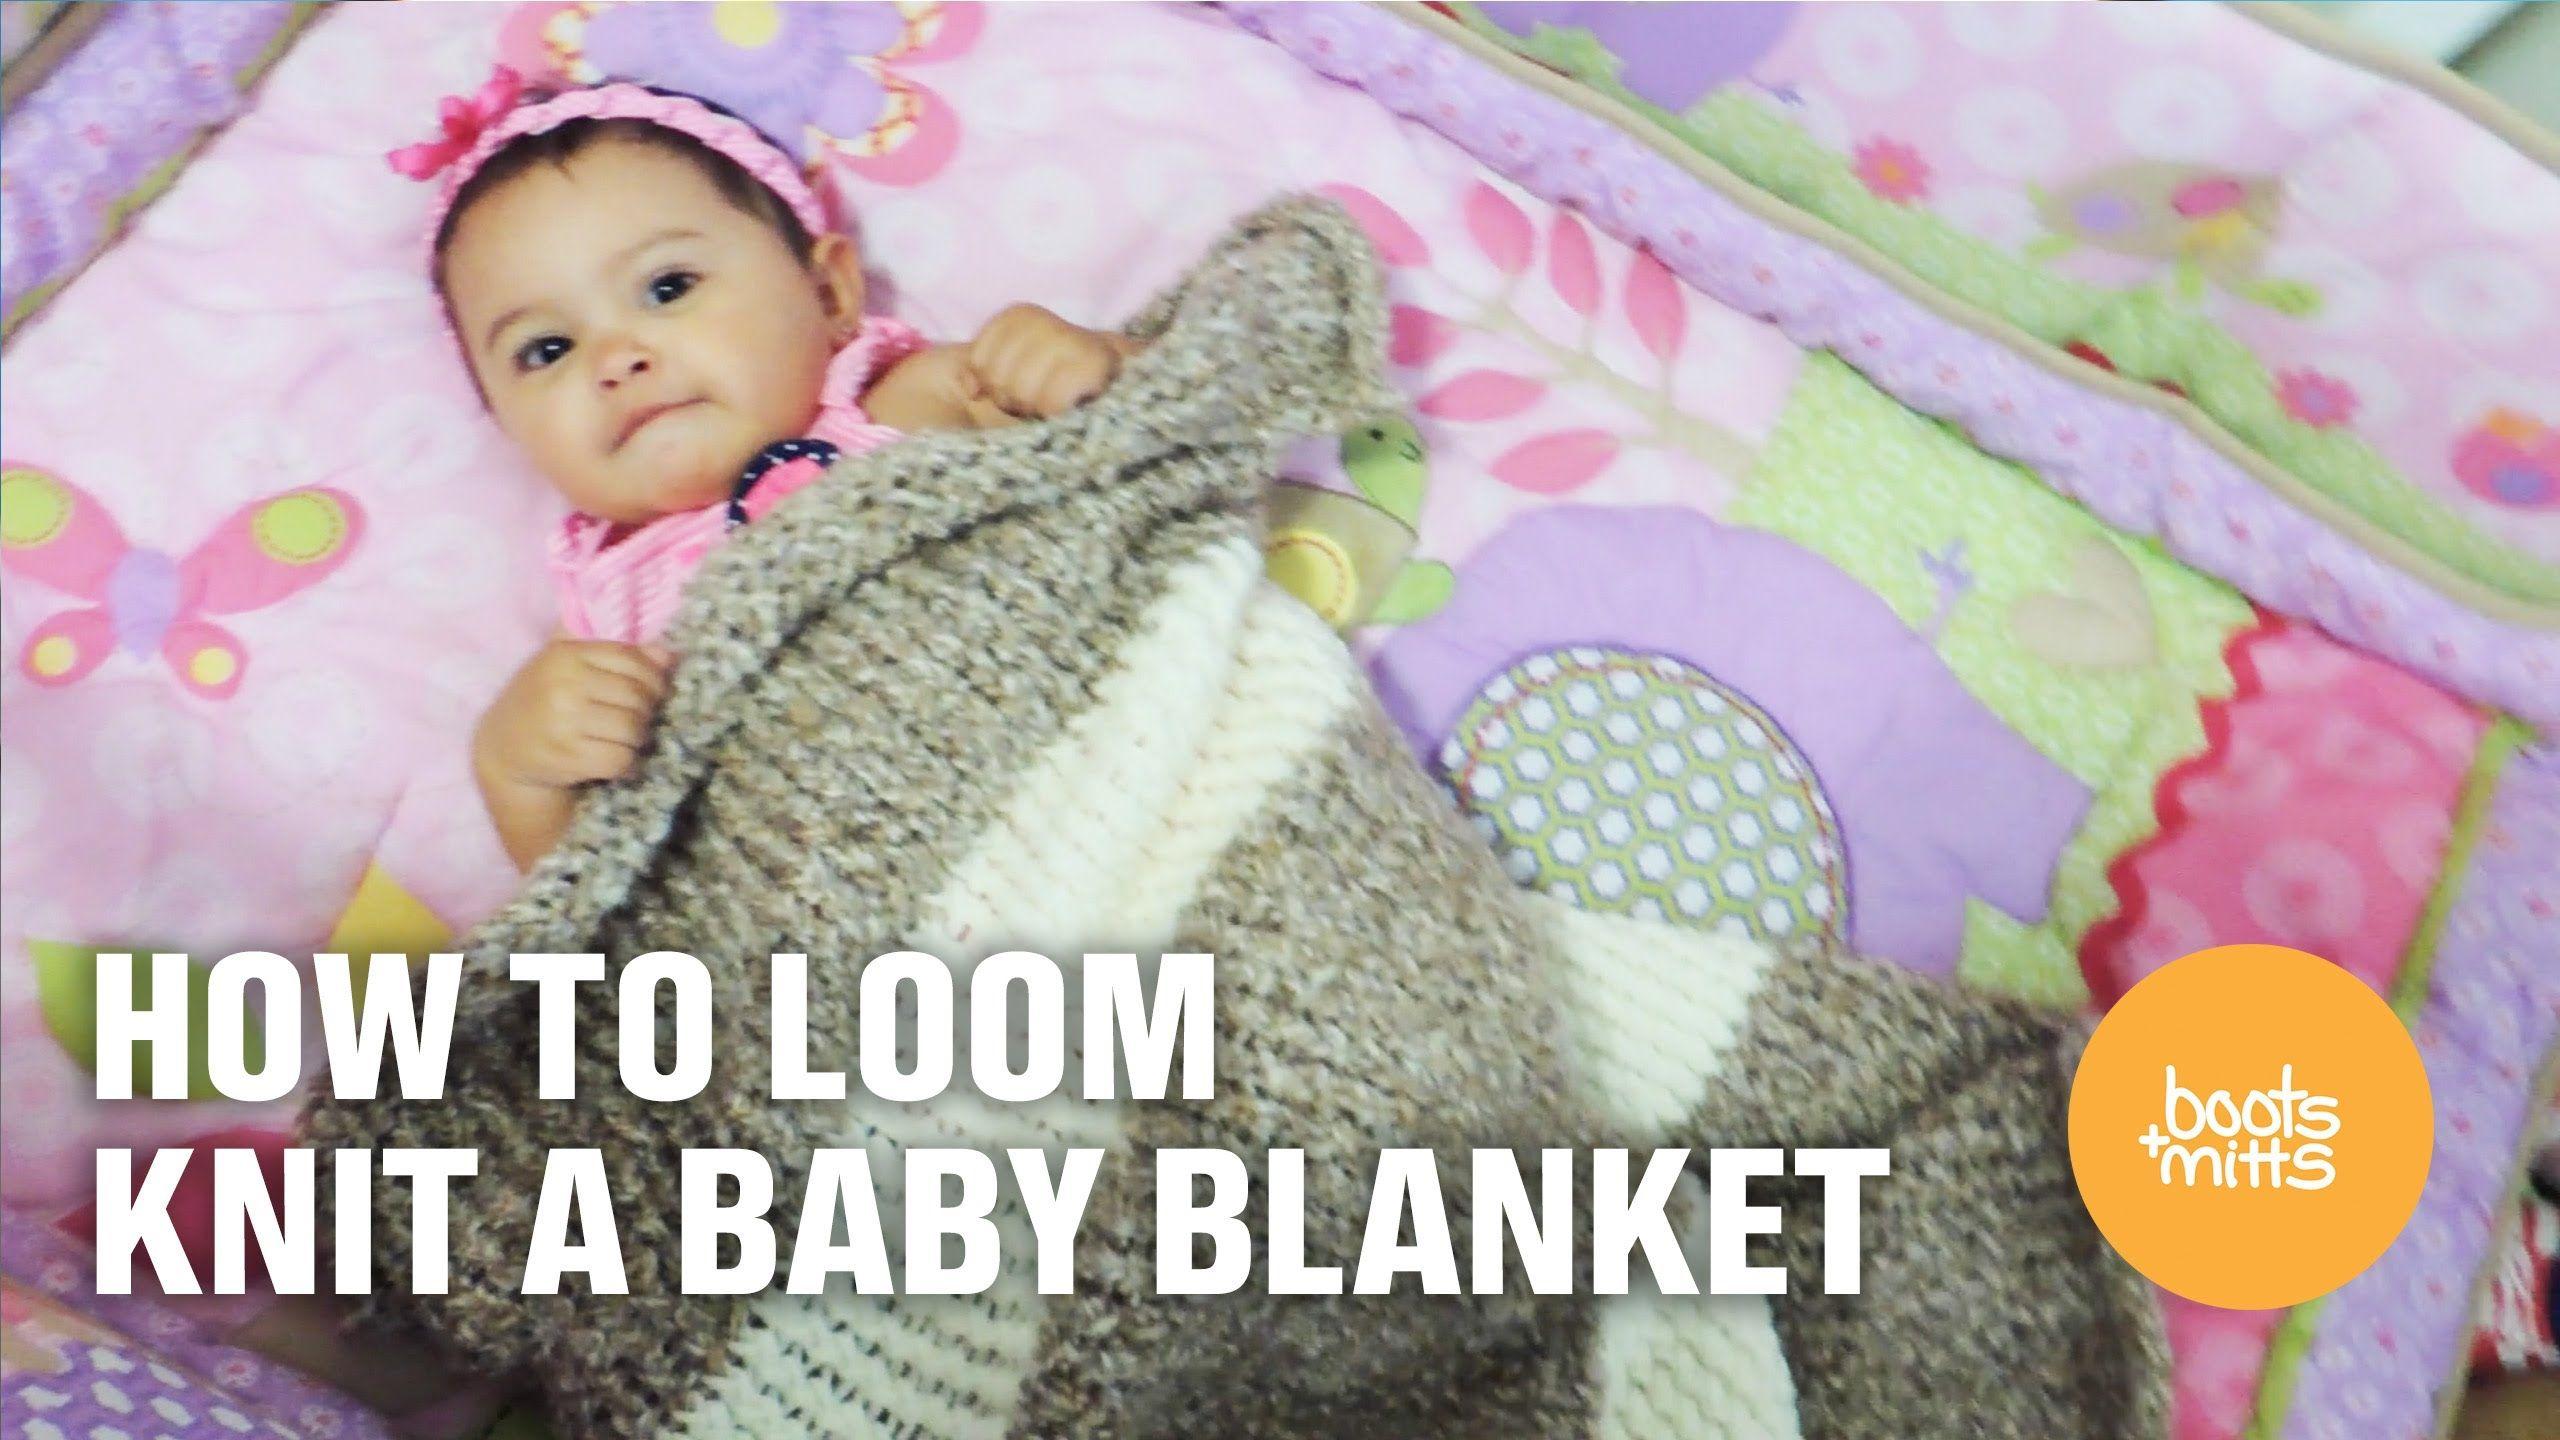 Beautiful Baby Blanket Loom Knitting Patterns Pattern - Sewing ...